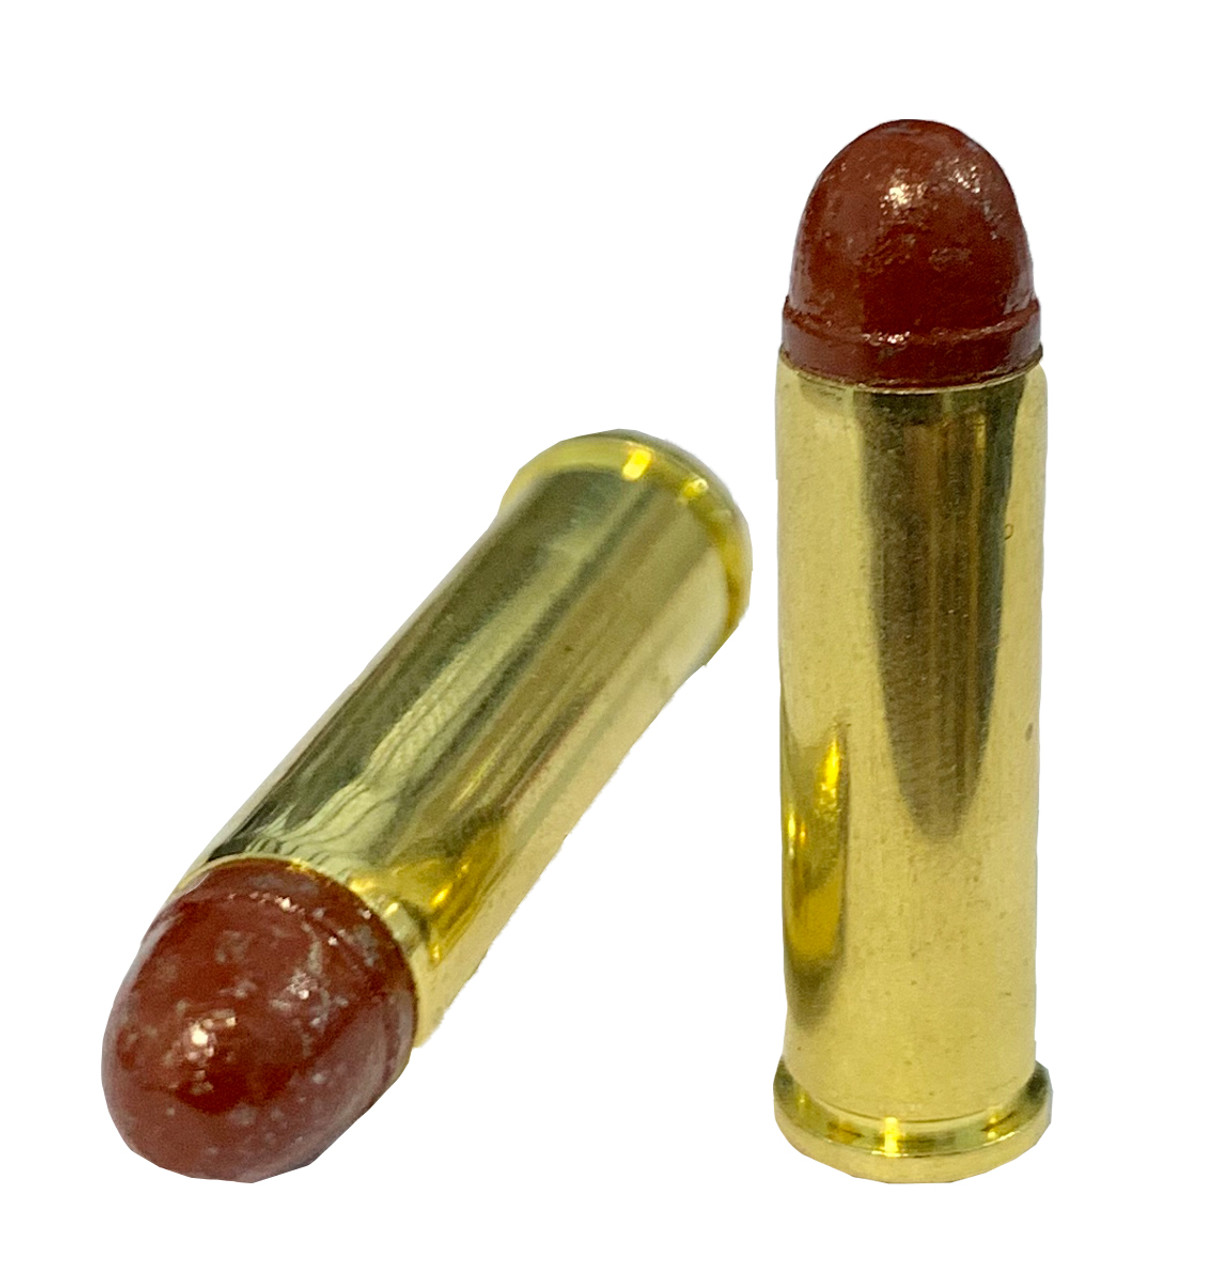 Half a Hand Henri's 32 H&R Magnum 78g RN Coated Bullets